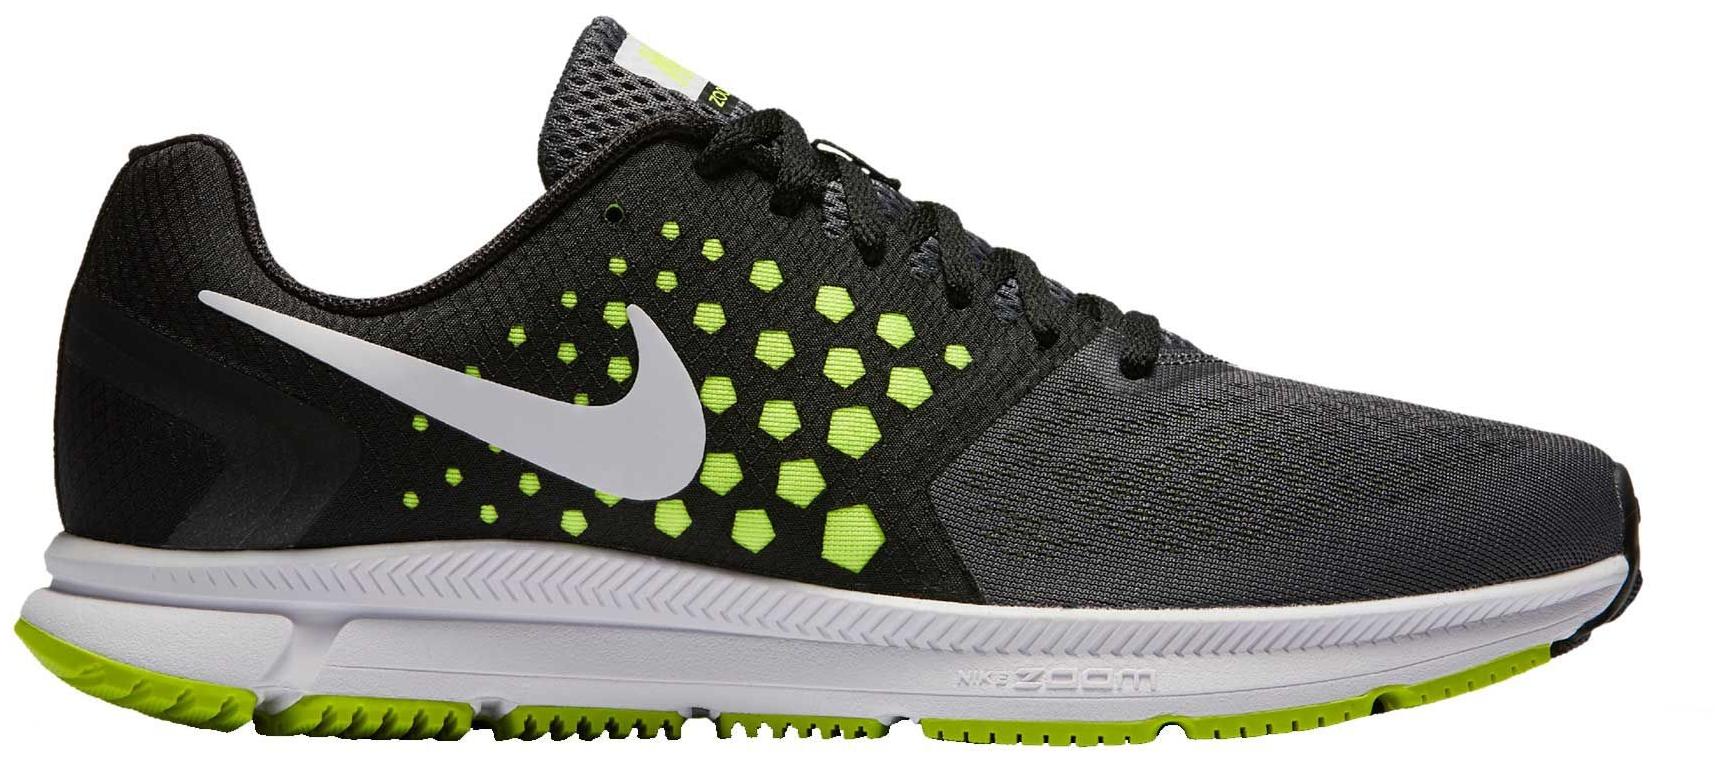 Nike Men's Air Zoom Span Running Shoes (Black/Volt, 7.5)